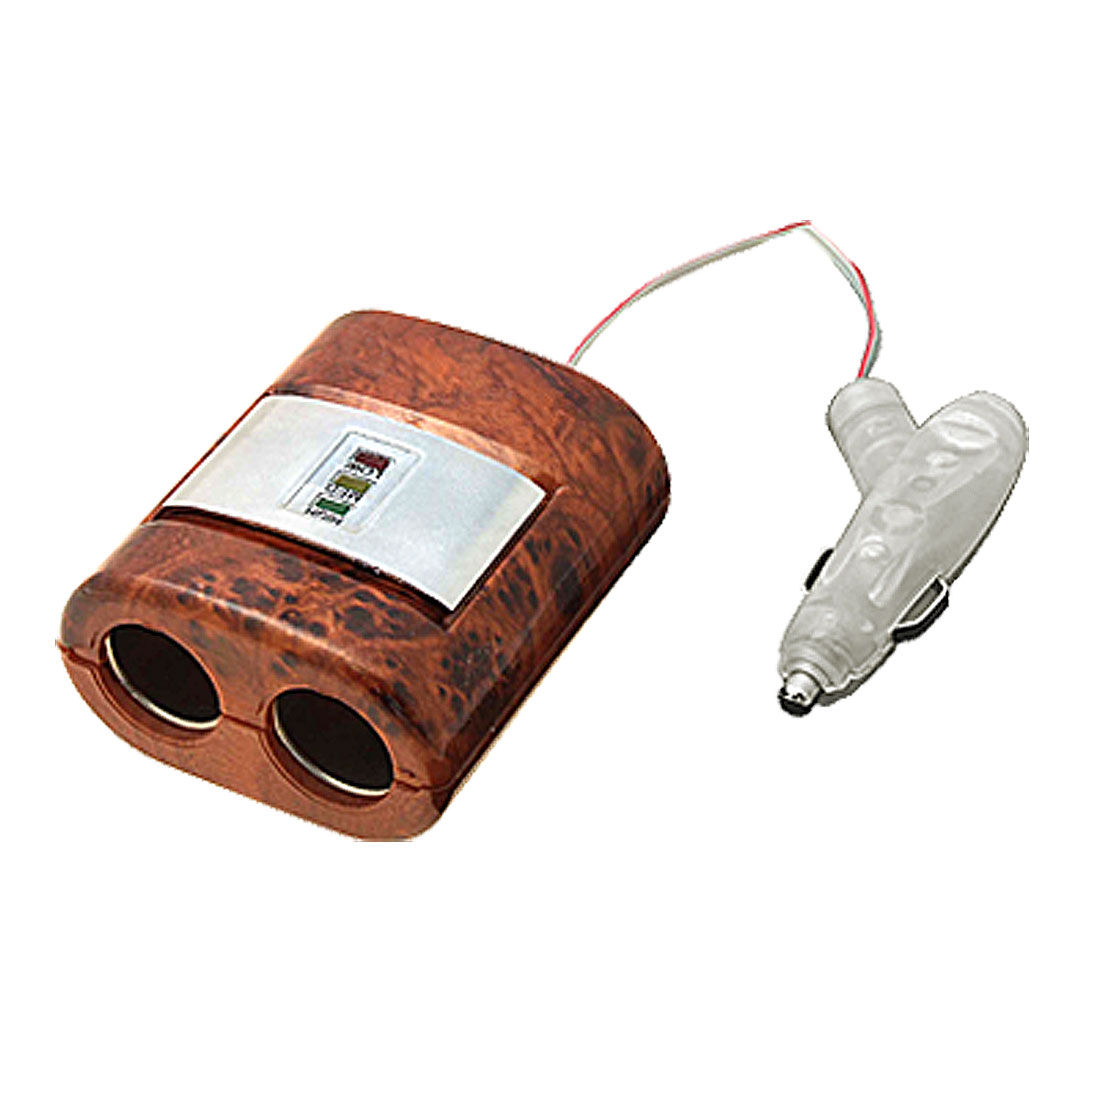 12V Auto Car Vehicle Cigarette Lighter Socket 4 Way Splitter Adapter (AZ-46)